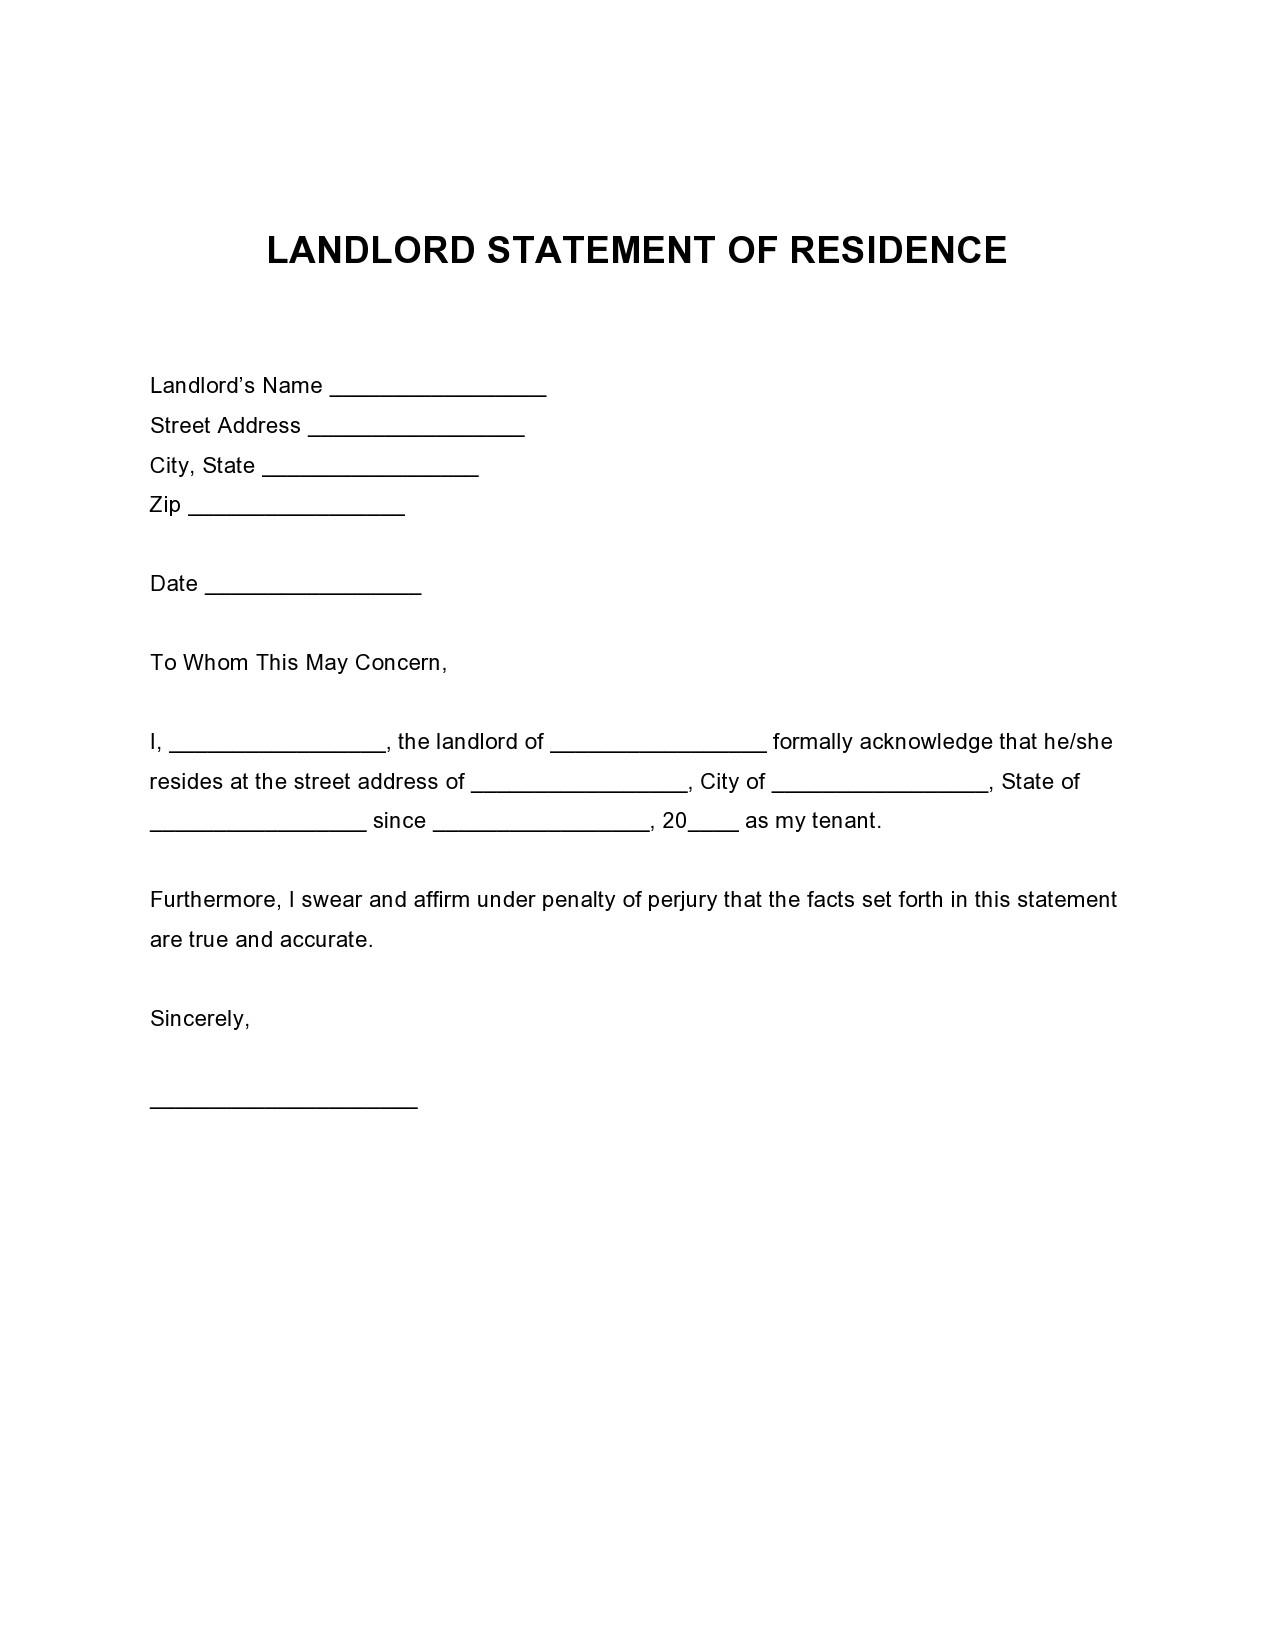 Free landlord statment 34